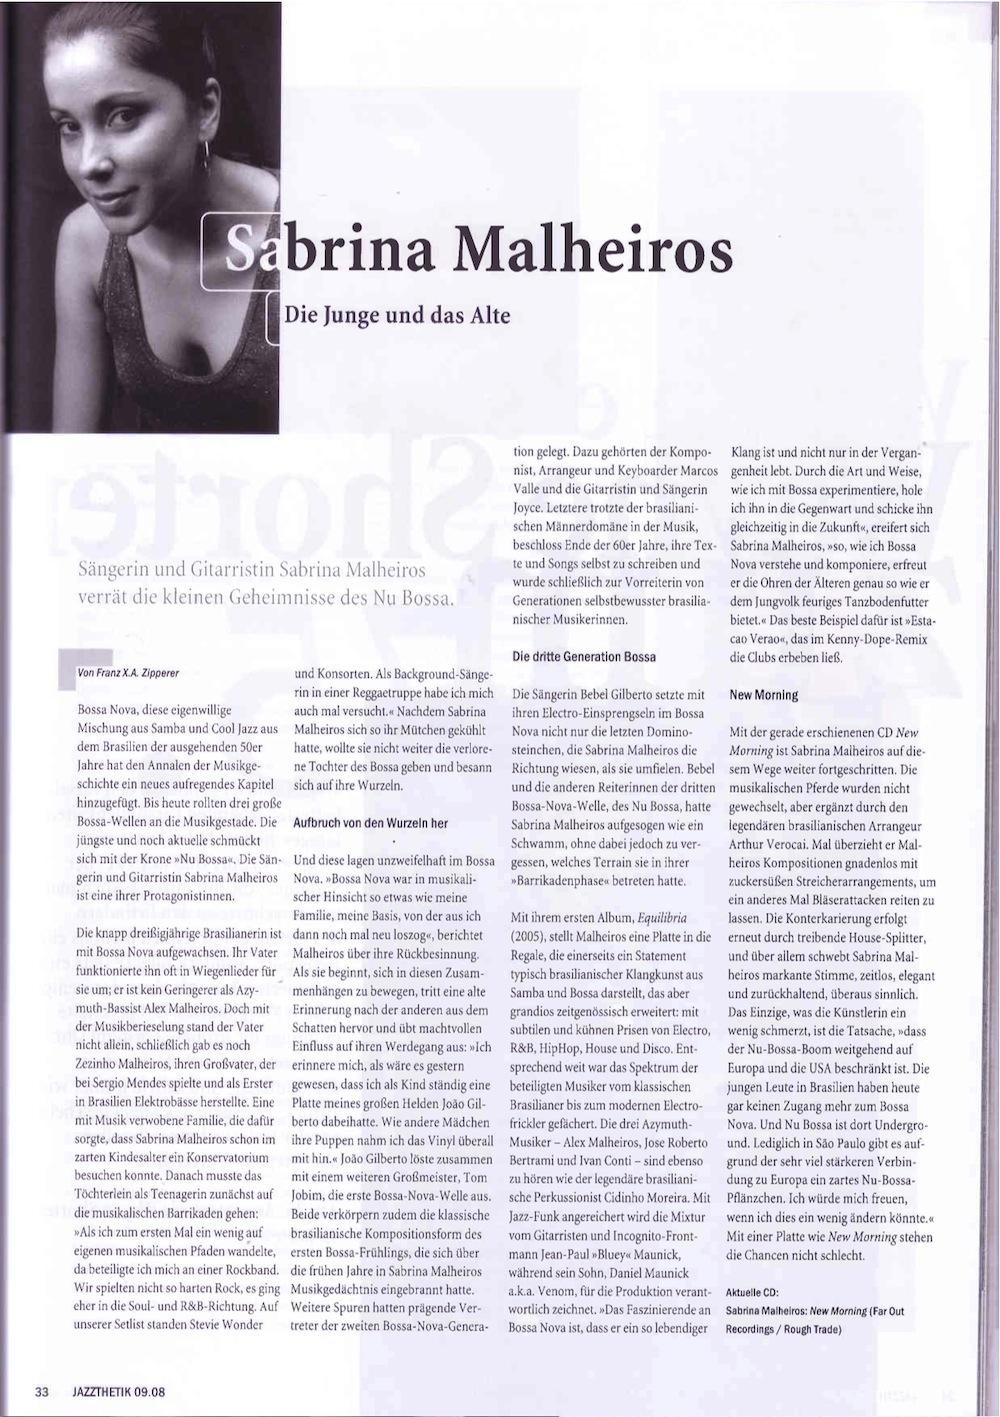 Jazzthetic Interview (Germany)